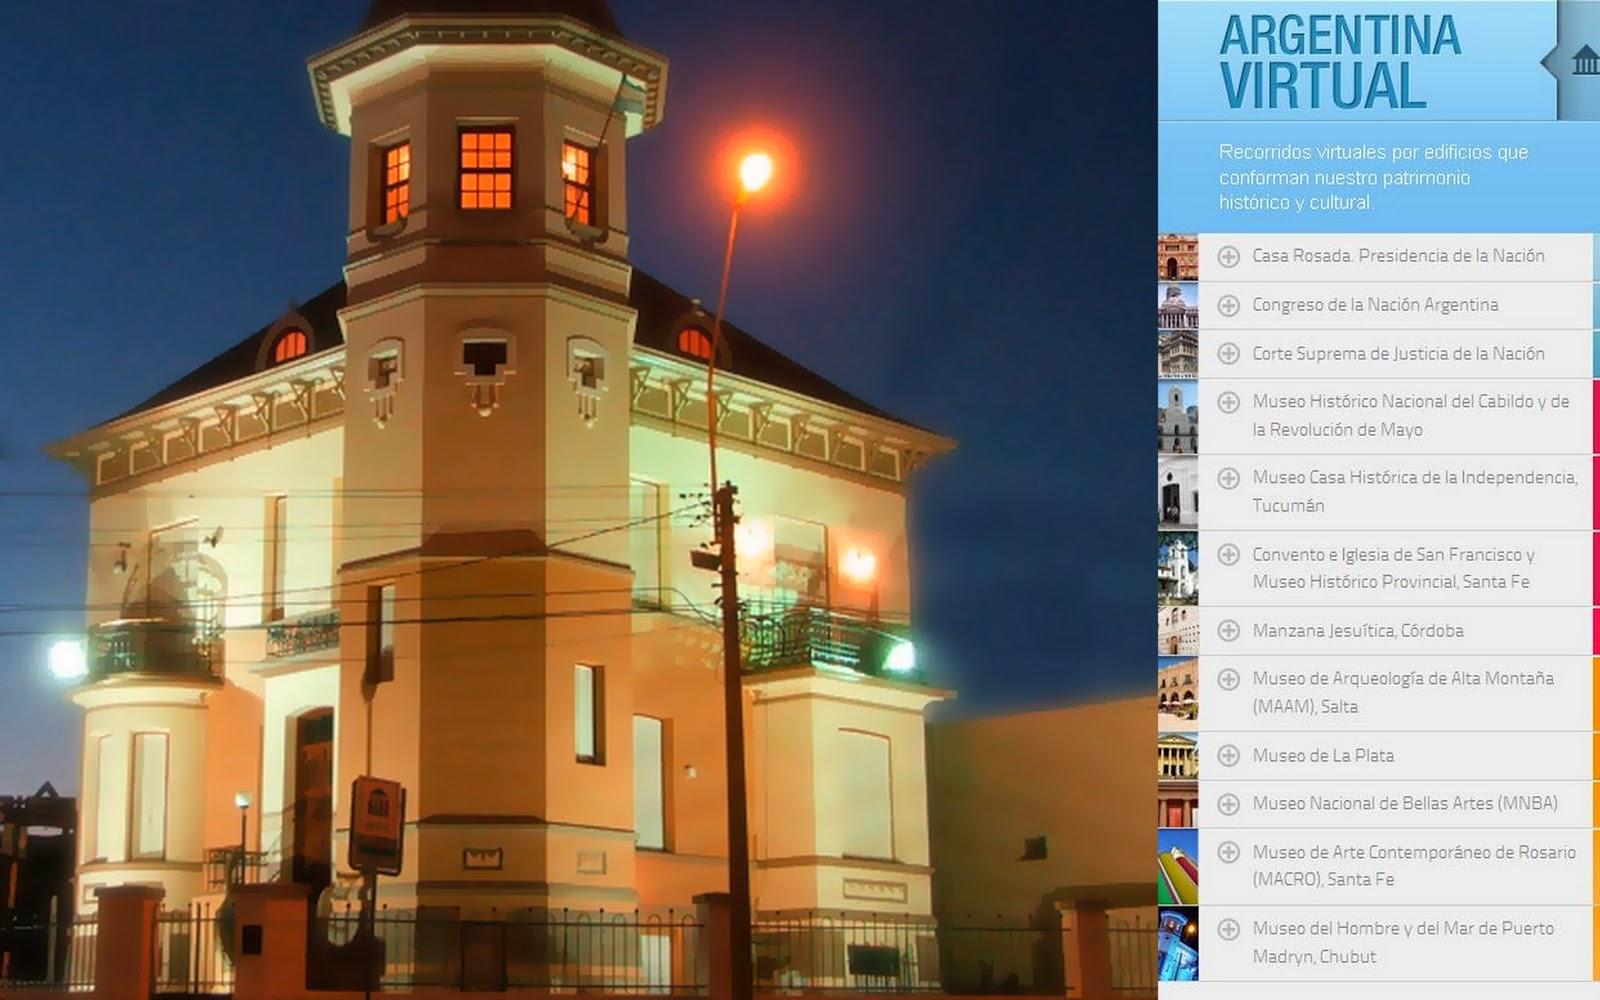 http://www.argentinavirtual.educ.ar/localhost/index.html